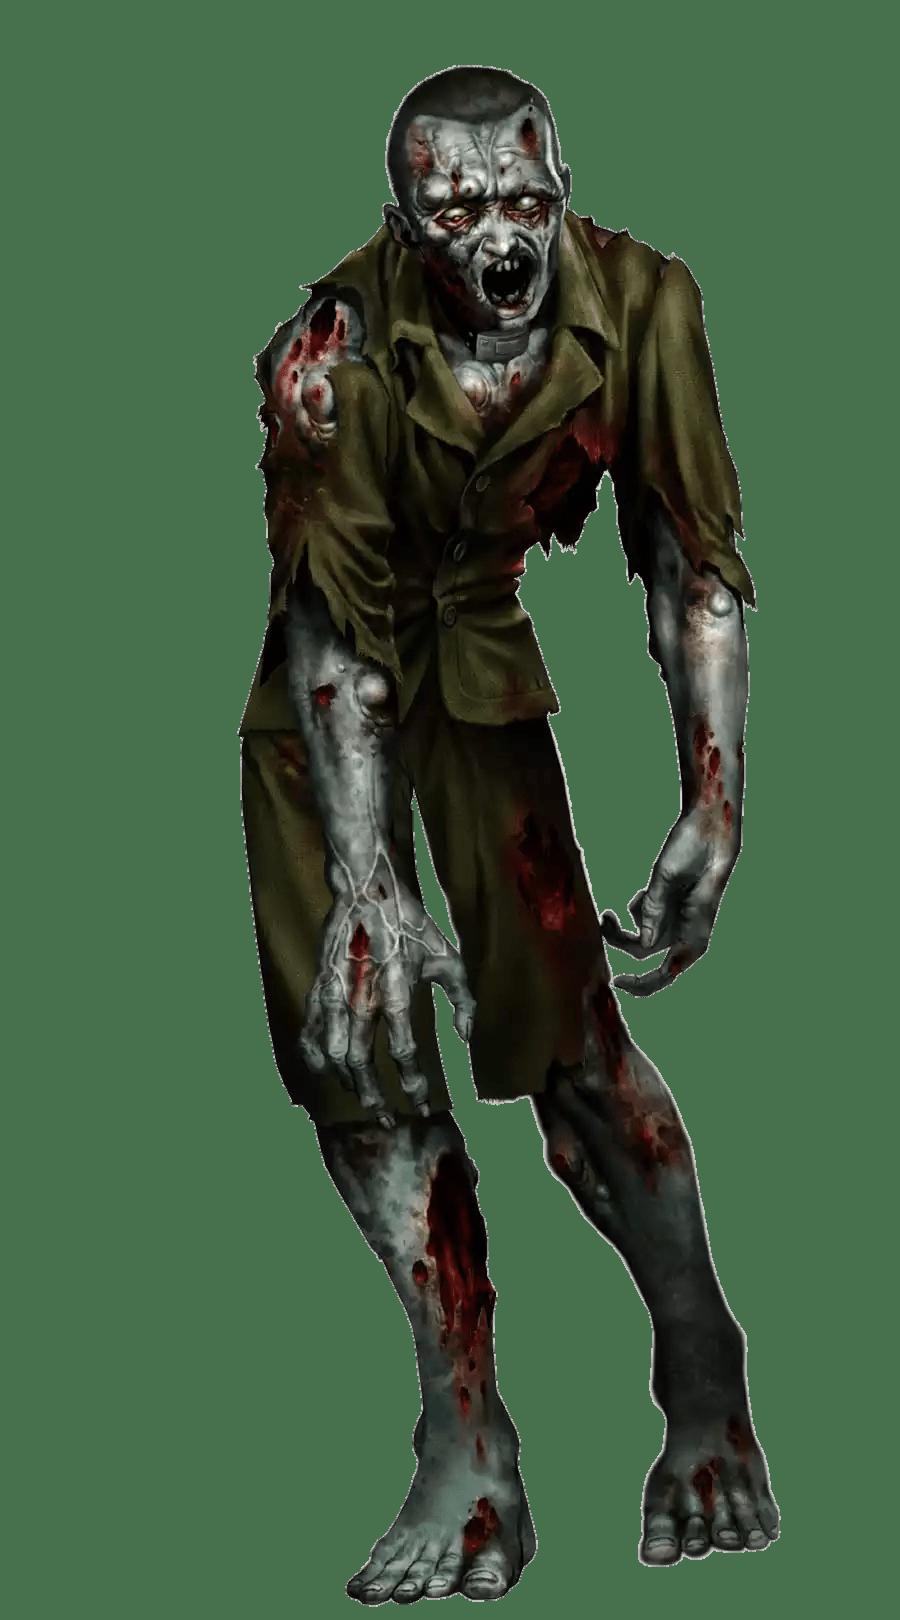 Horror Transparent Background